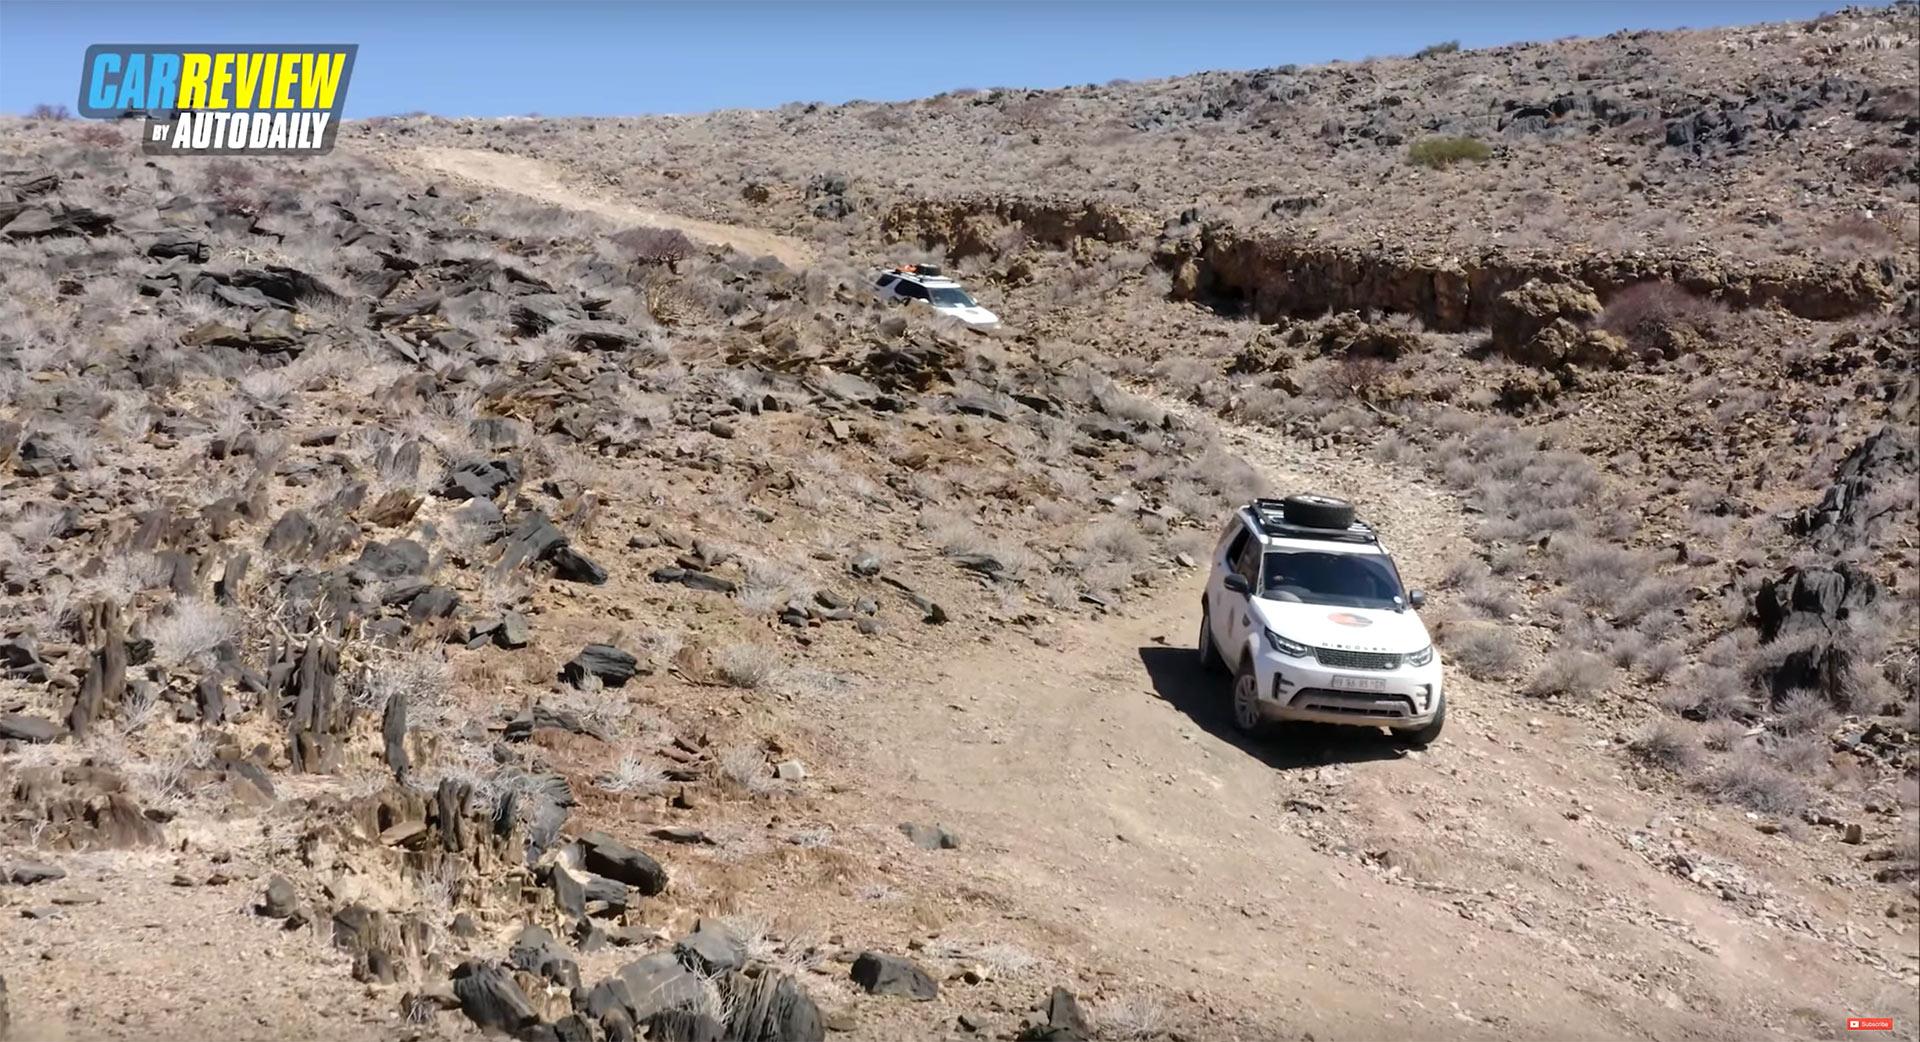 trail-to-namibia-autodaily-p3-1.jpg